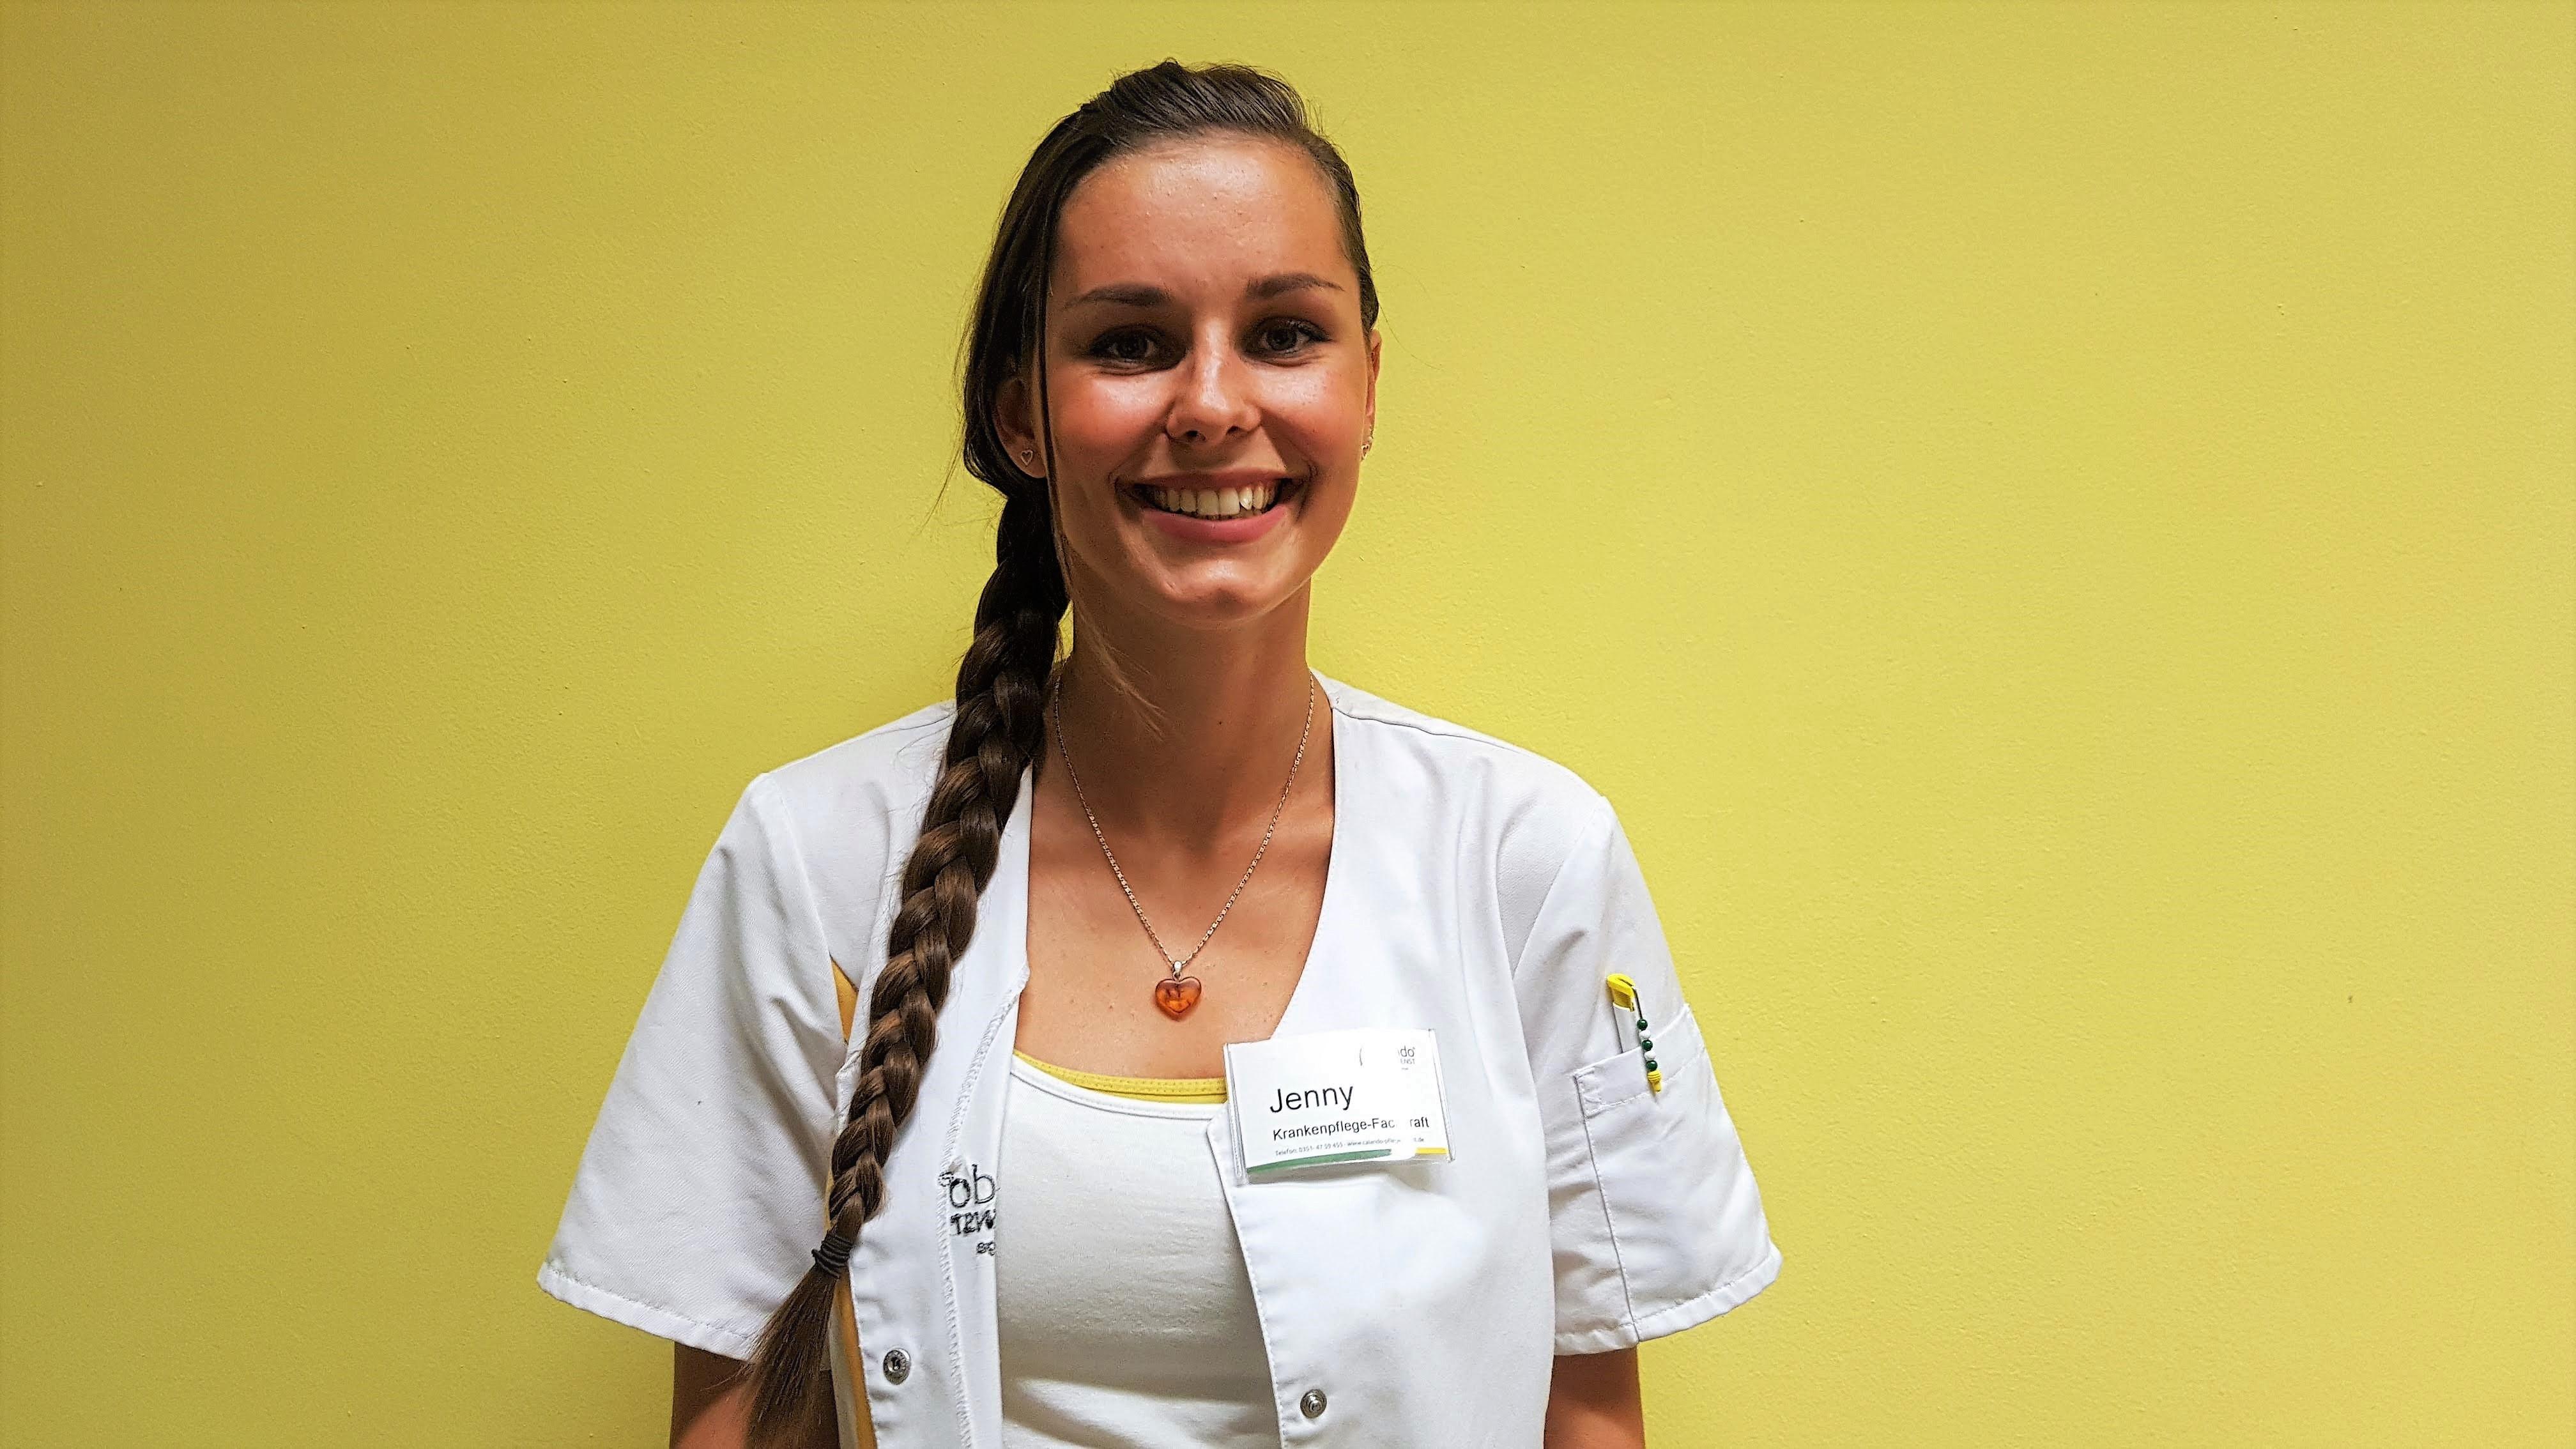 Im Porträt: Frau Graube vom Calando Pflegedienst